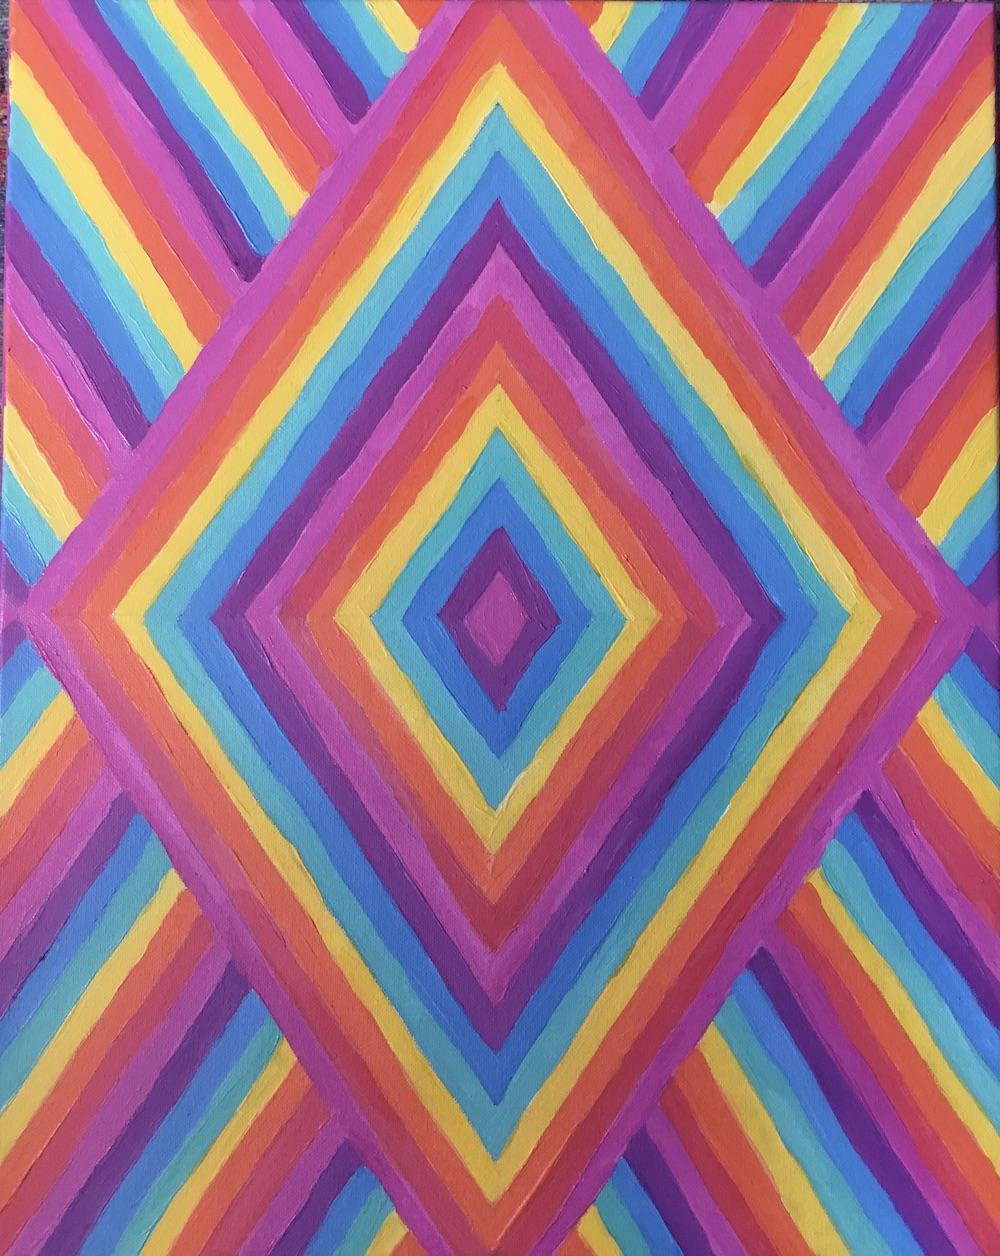 Rainbow vortex painting